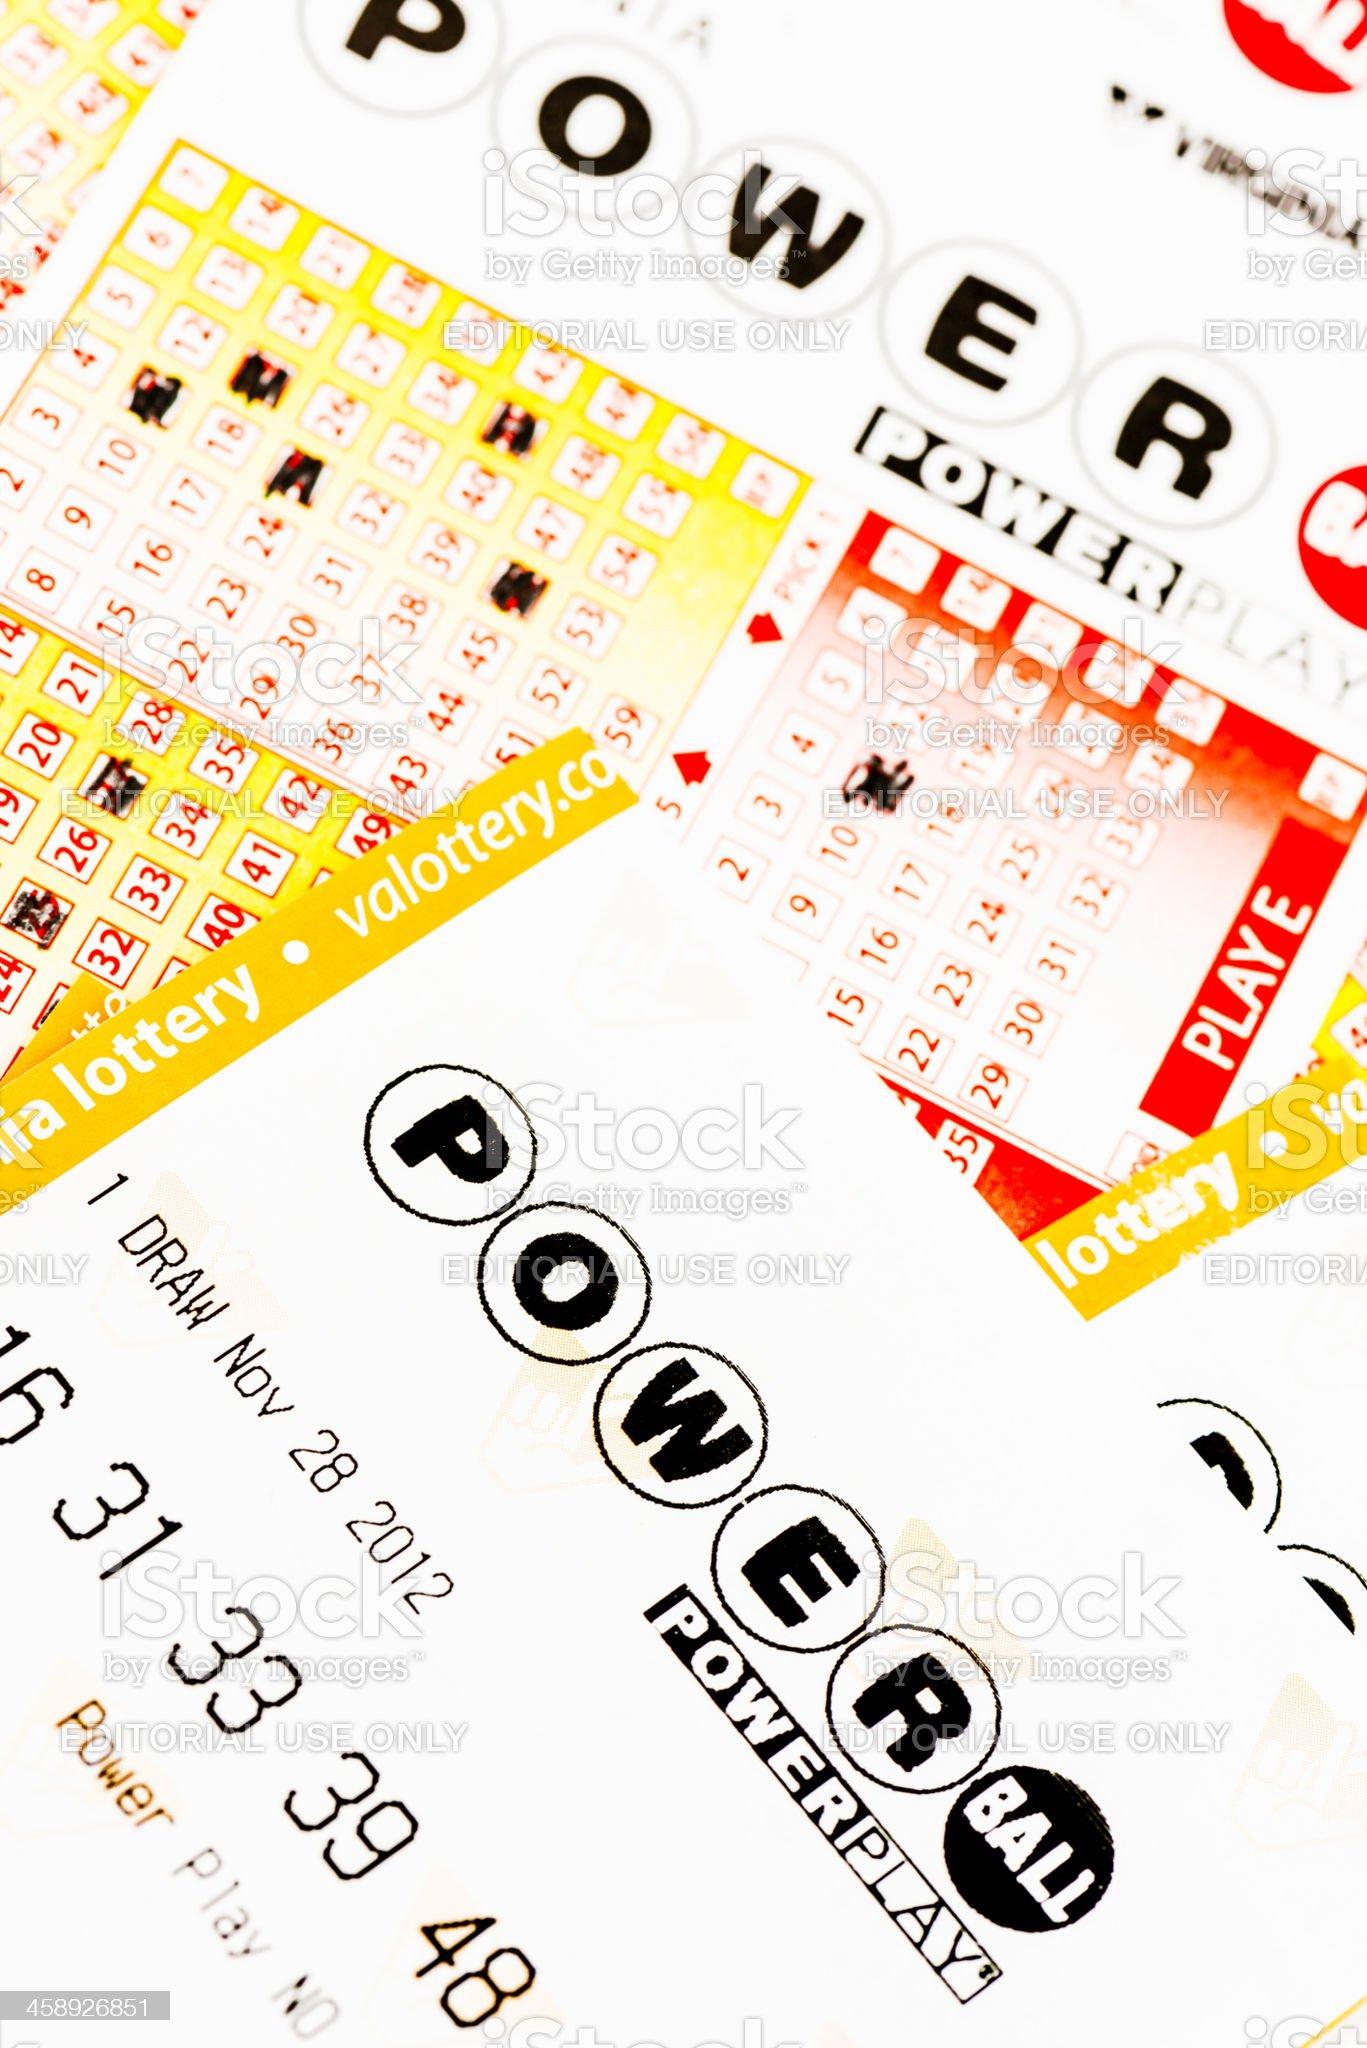 Powerball Lottery Ticket royalty-free stock photo